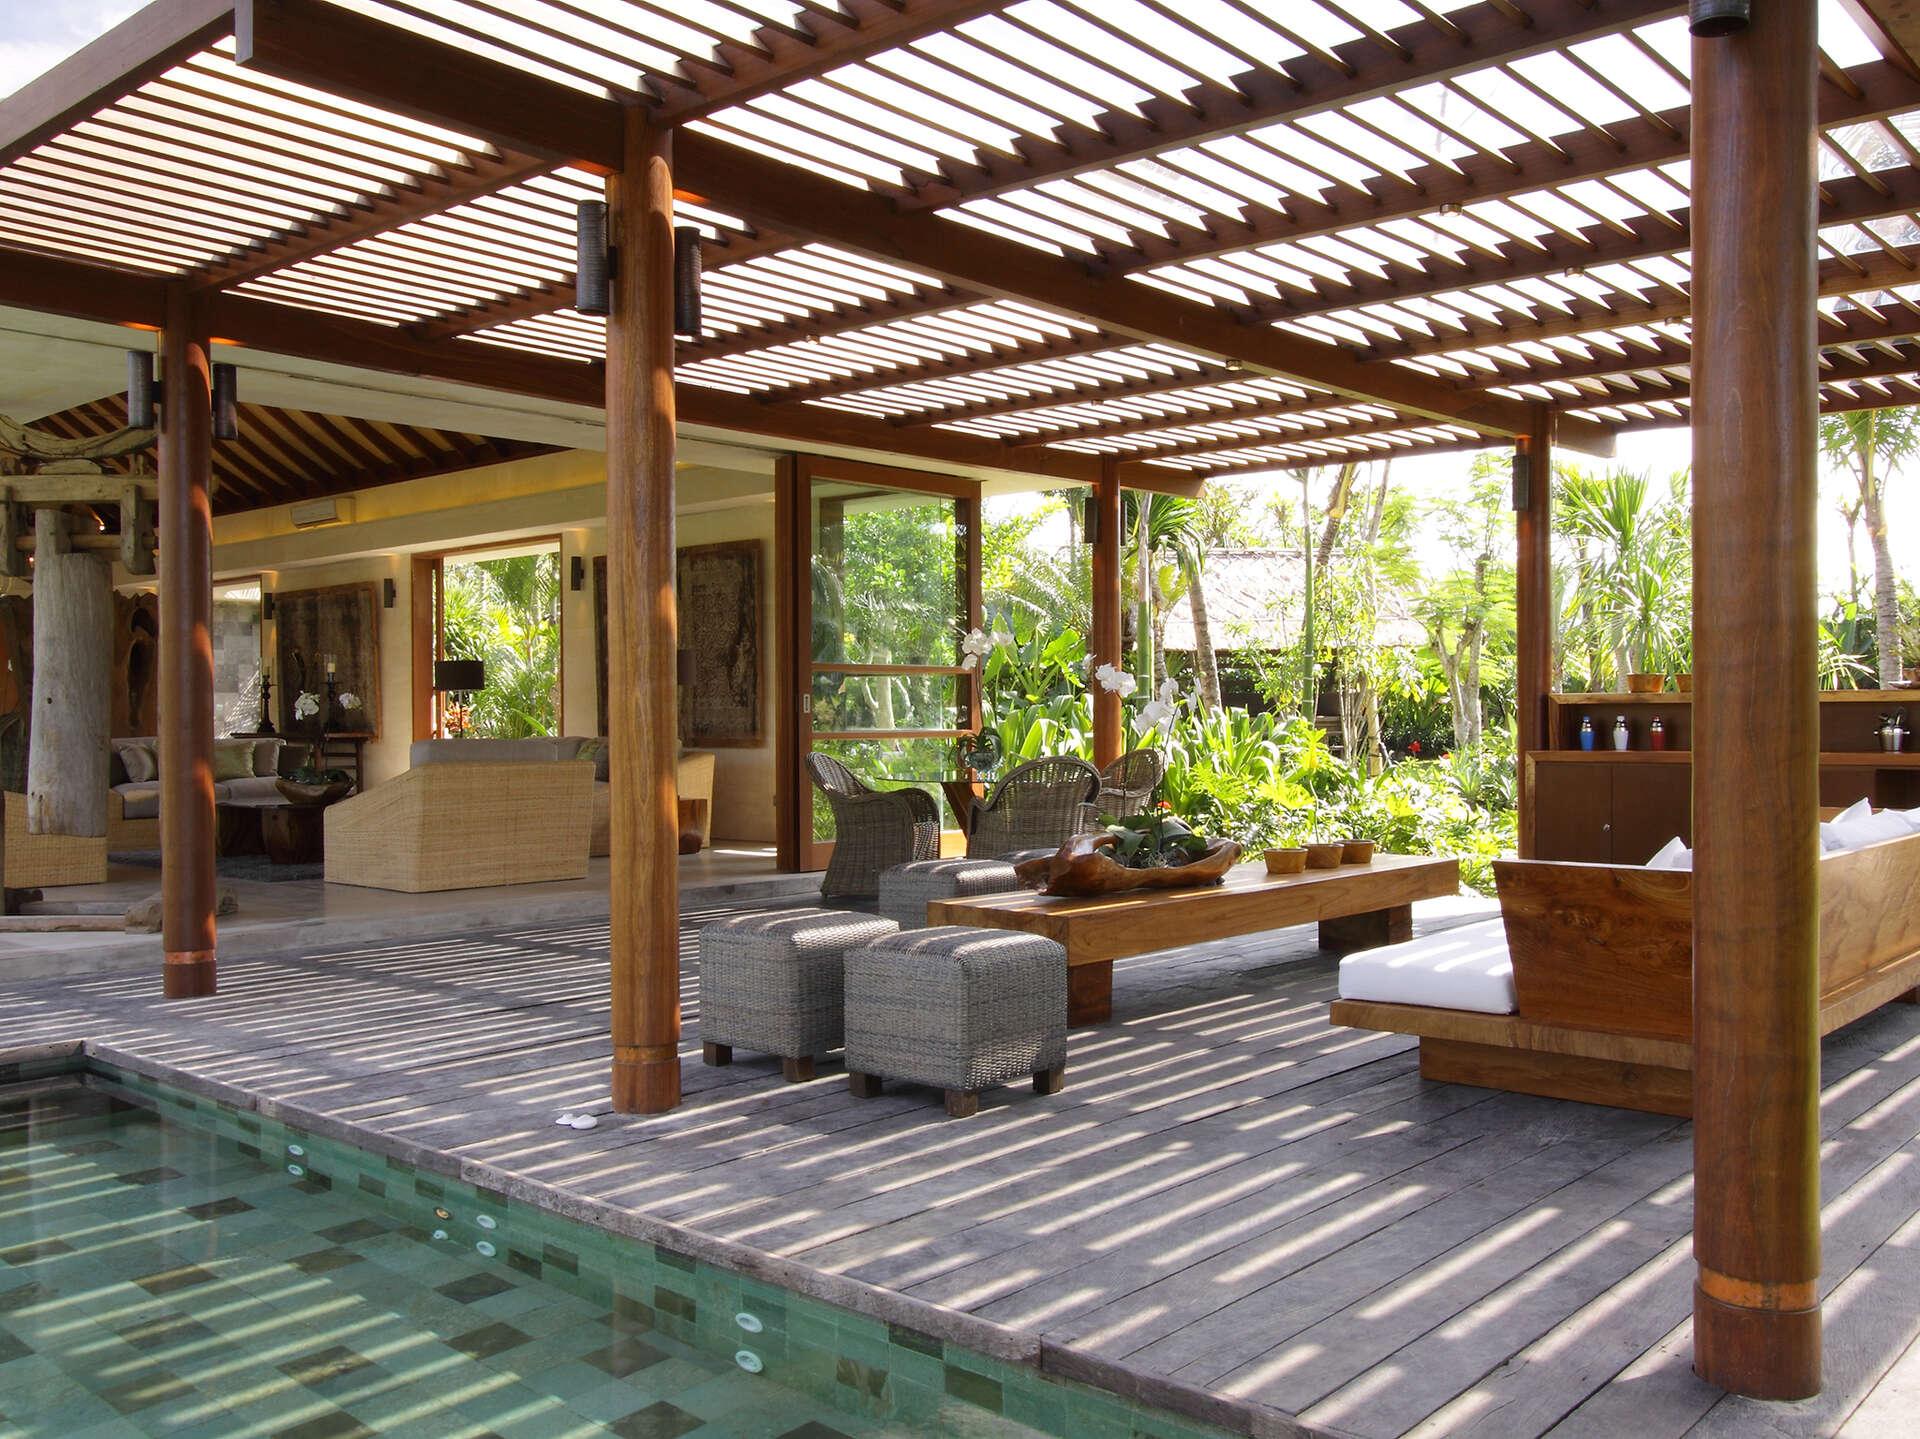 Luxury villa rentals asia - Indonesia - Bali - Canggu - Sarasvati - Image 1/20